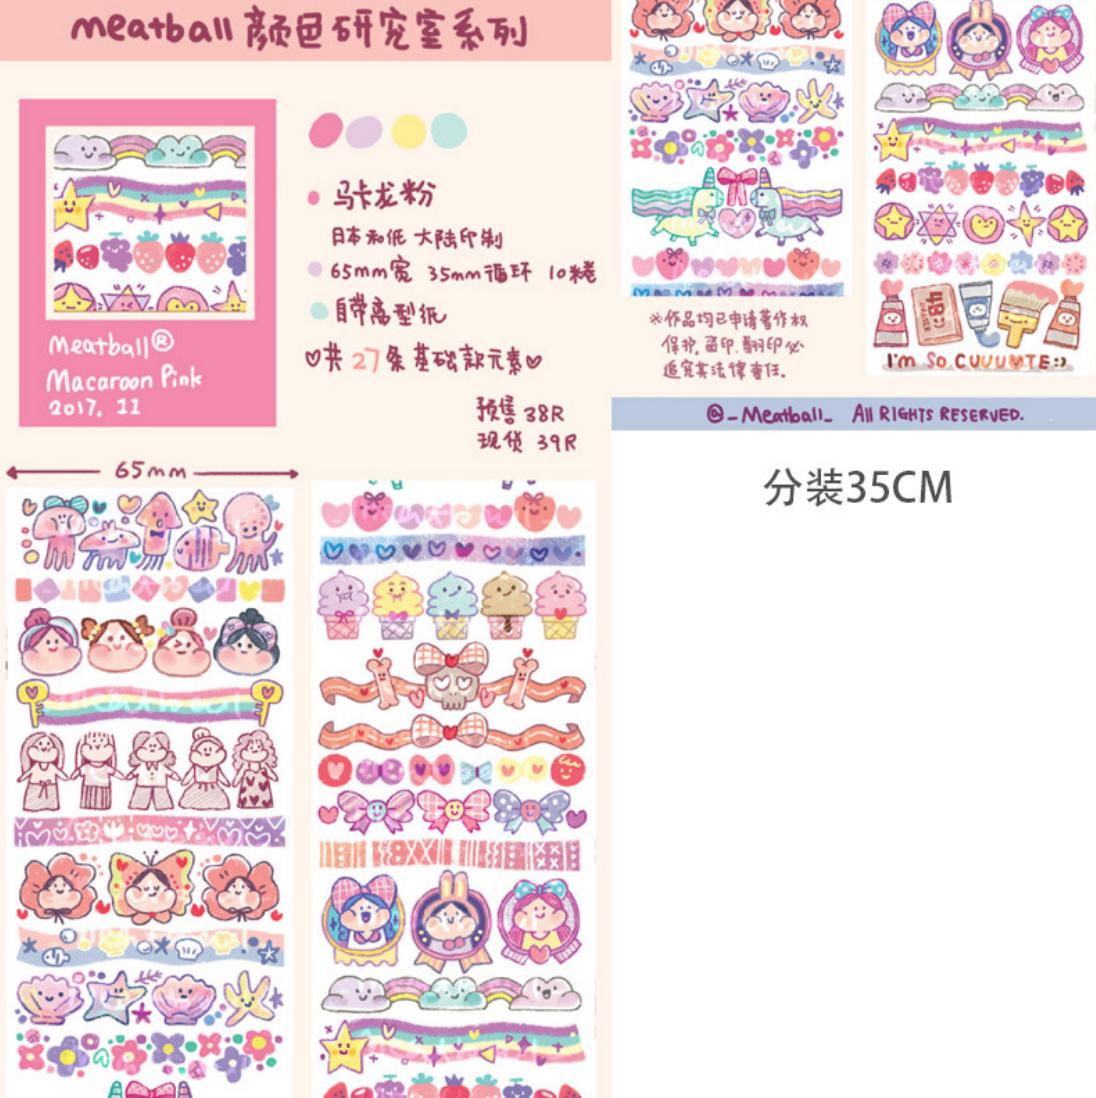 Meatball Stickers